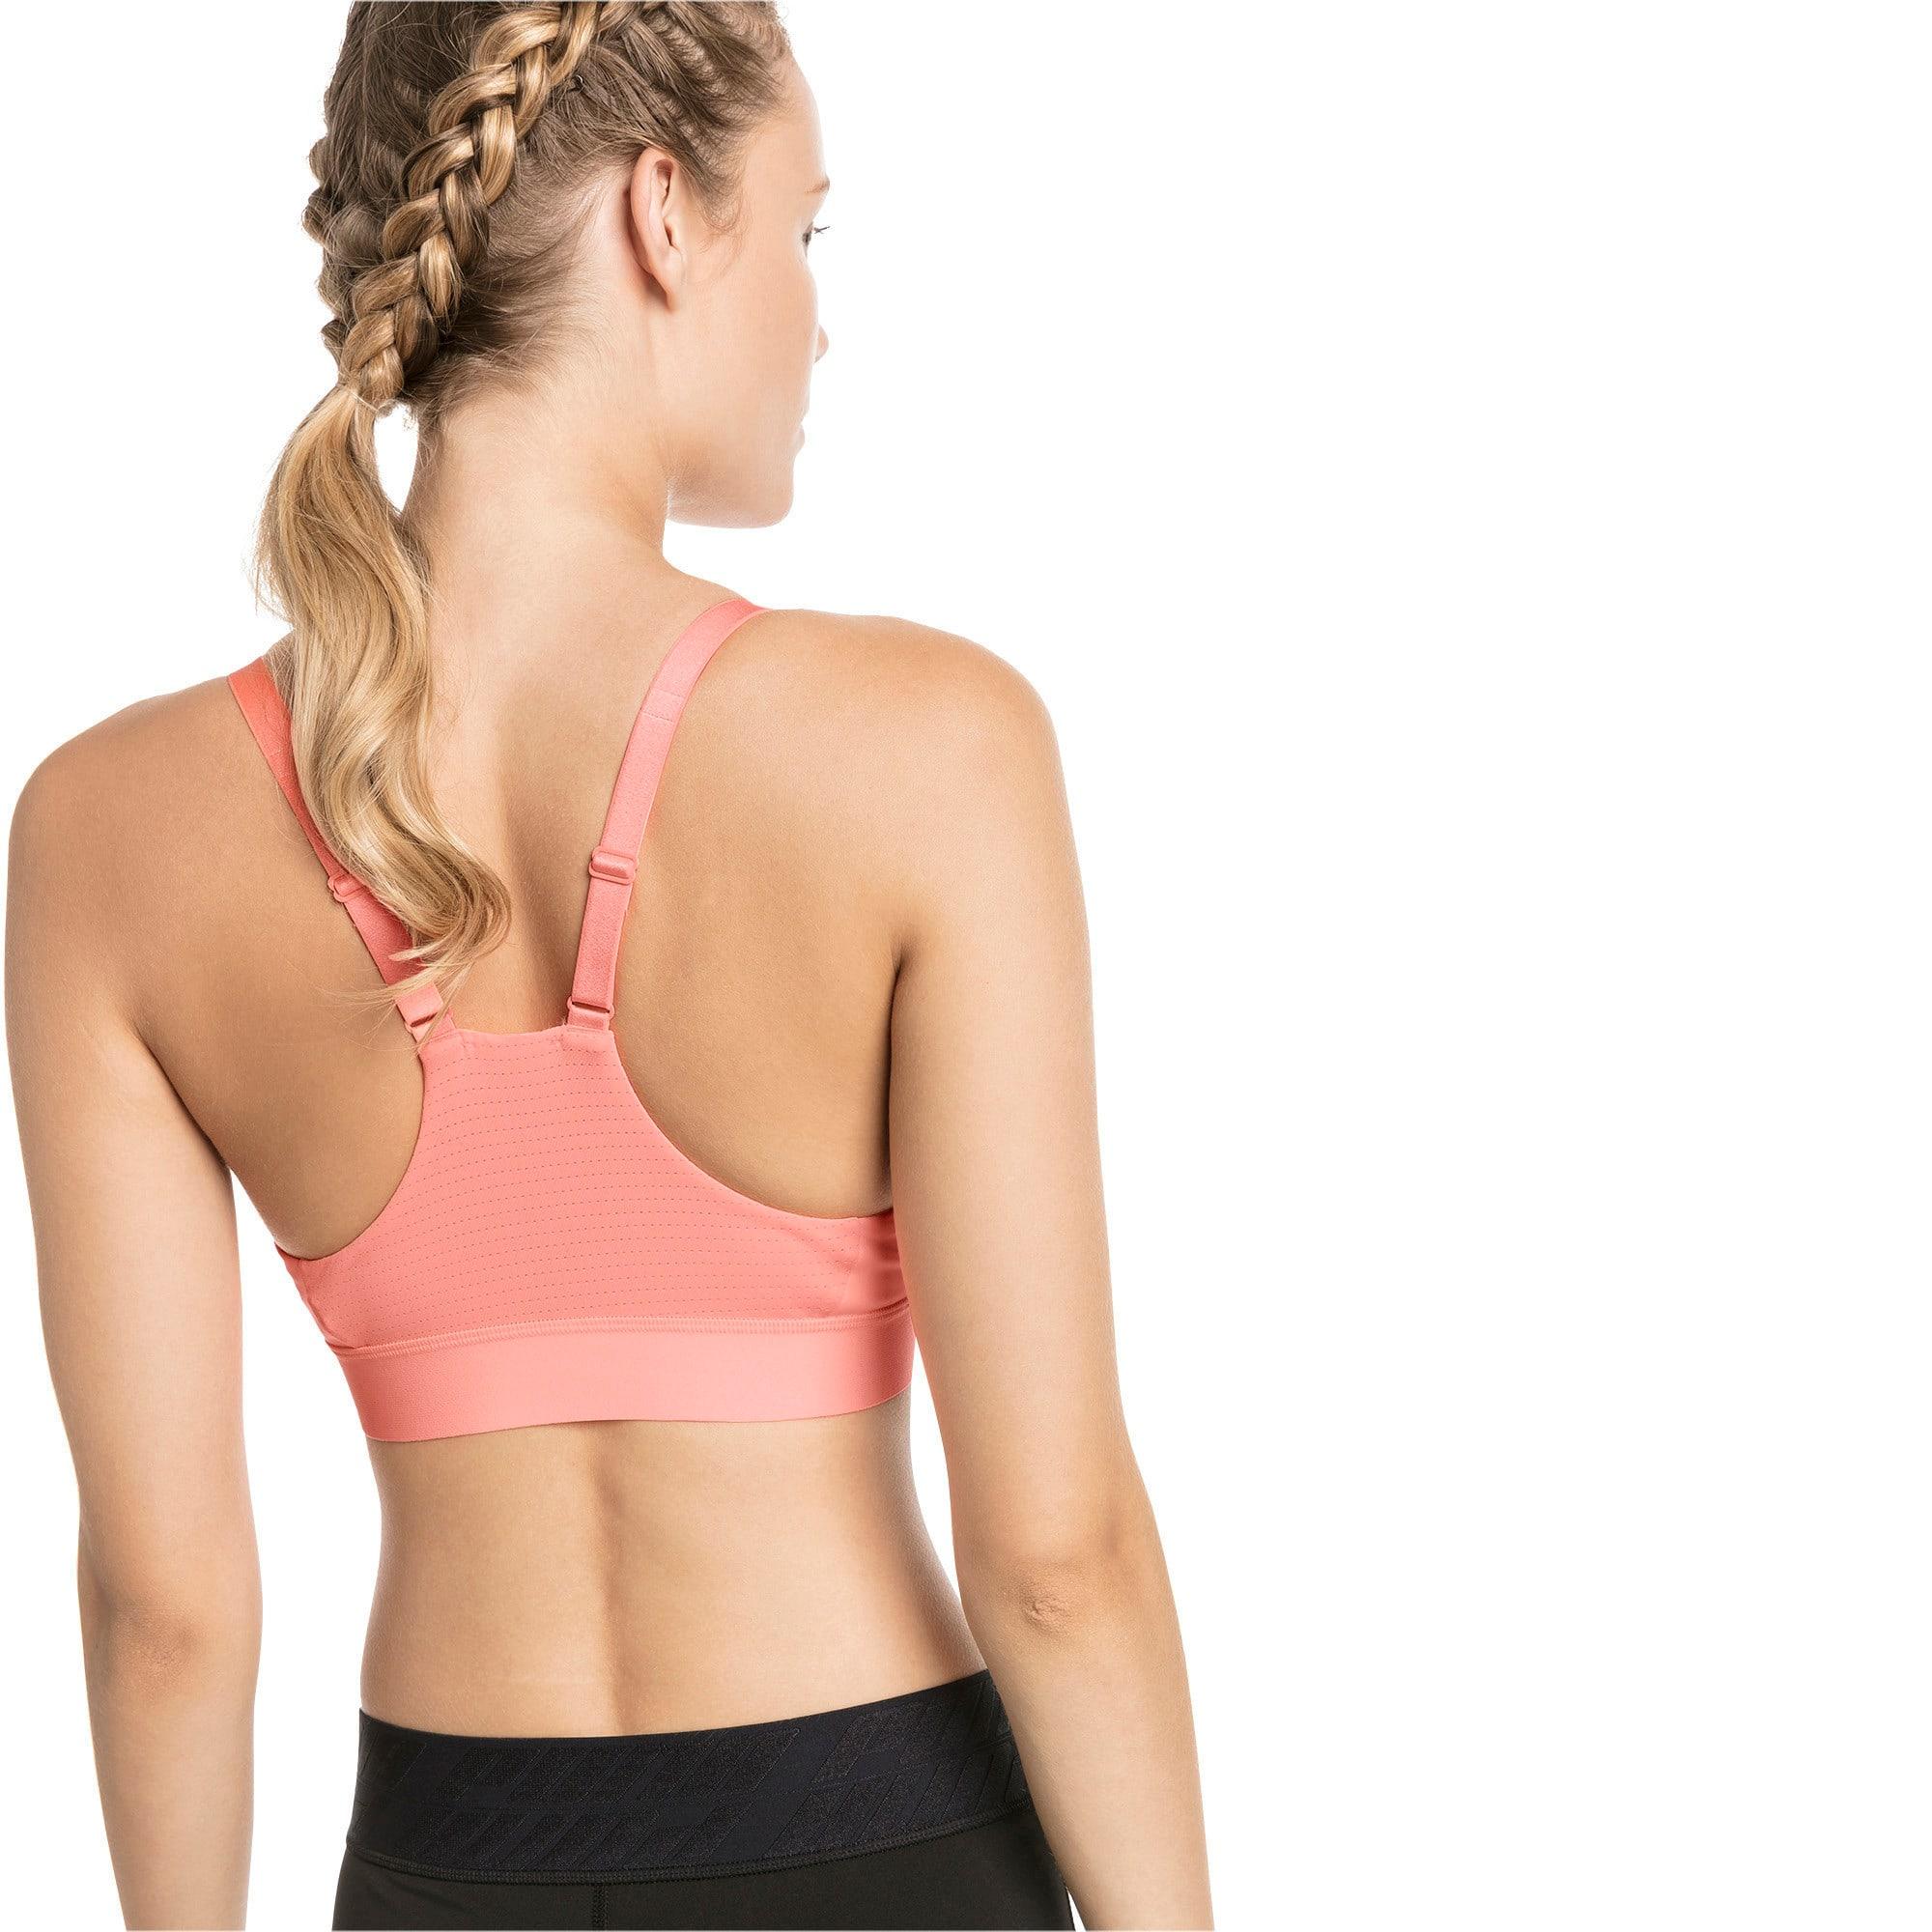 Thumbnail 2 of Mid Impact Logo Women's Bra Top, Bright Peach, medium-IND